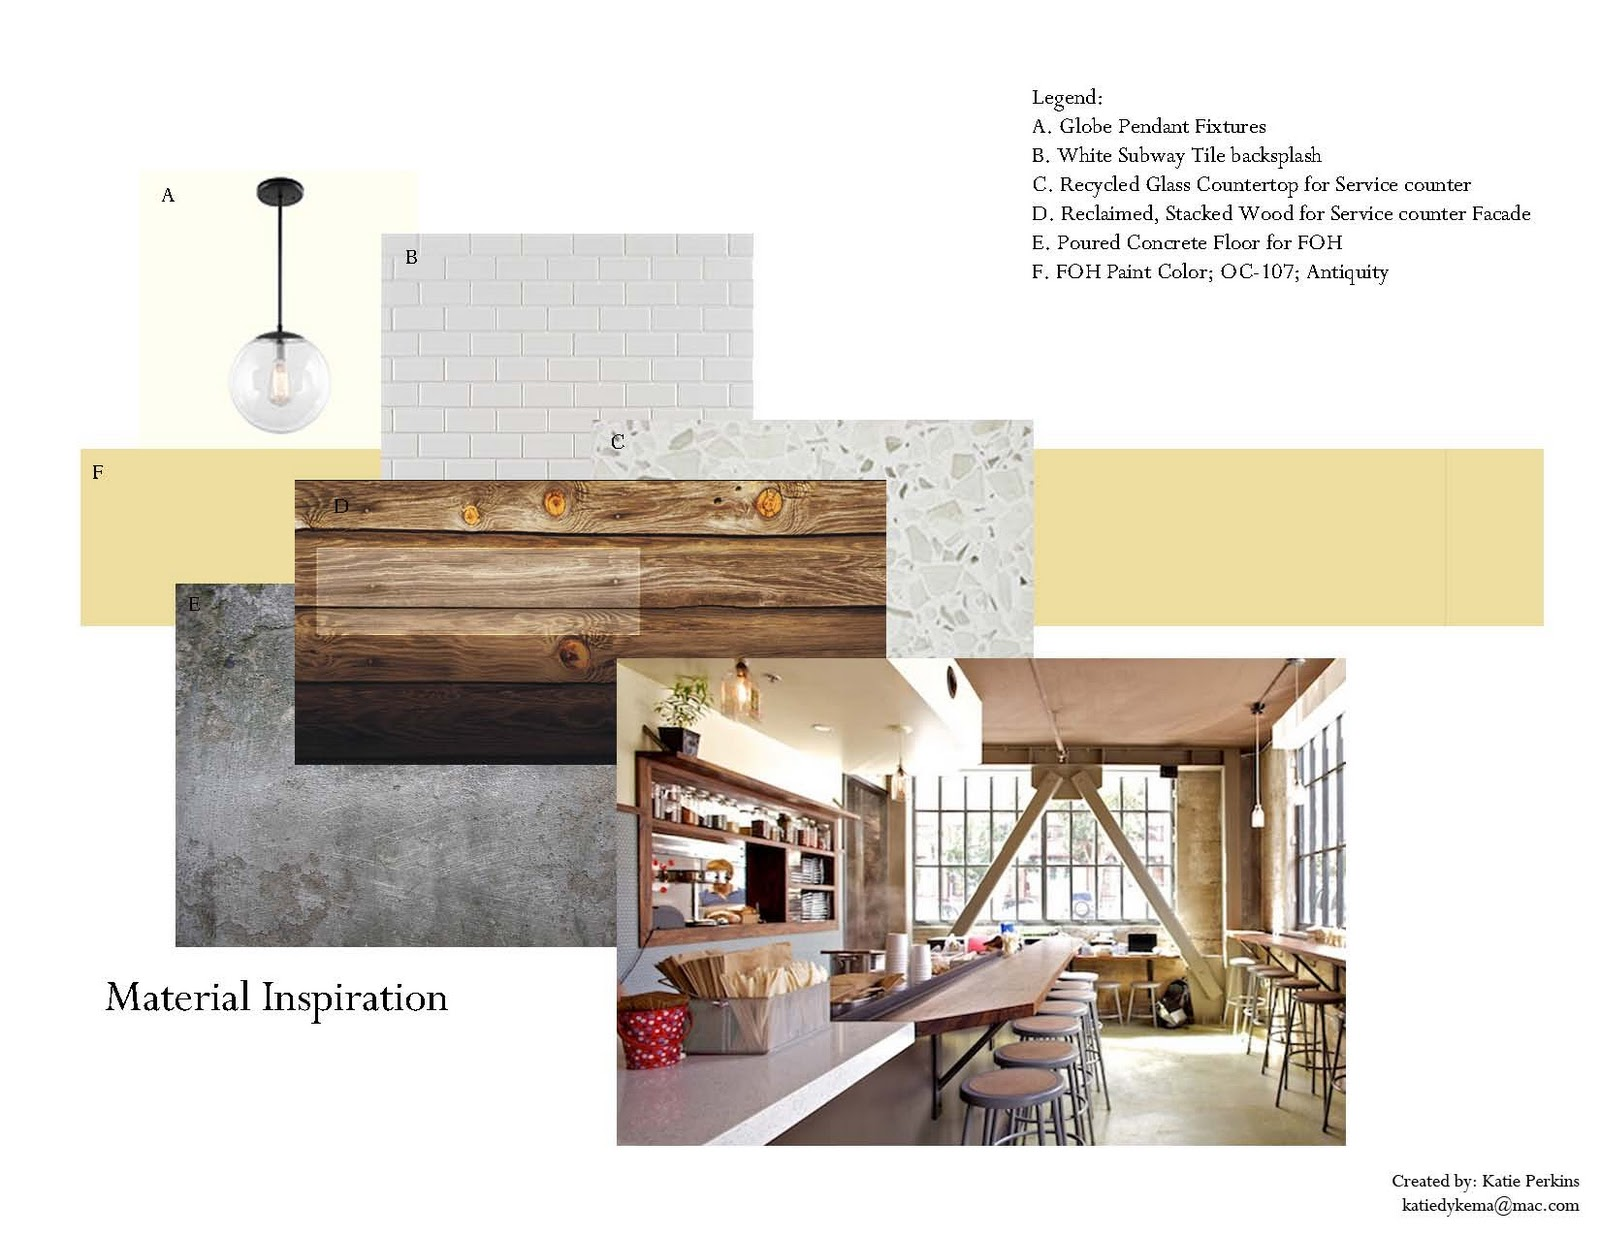 Kaper design restaurant hospitality design inspiration for Architectural concepts for restaurants